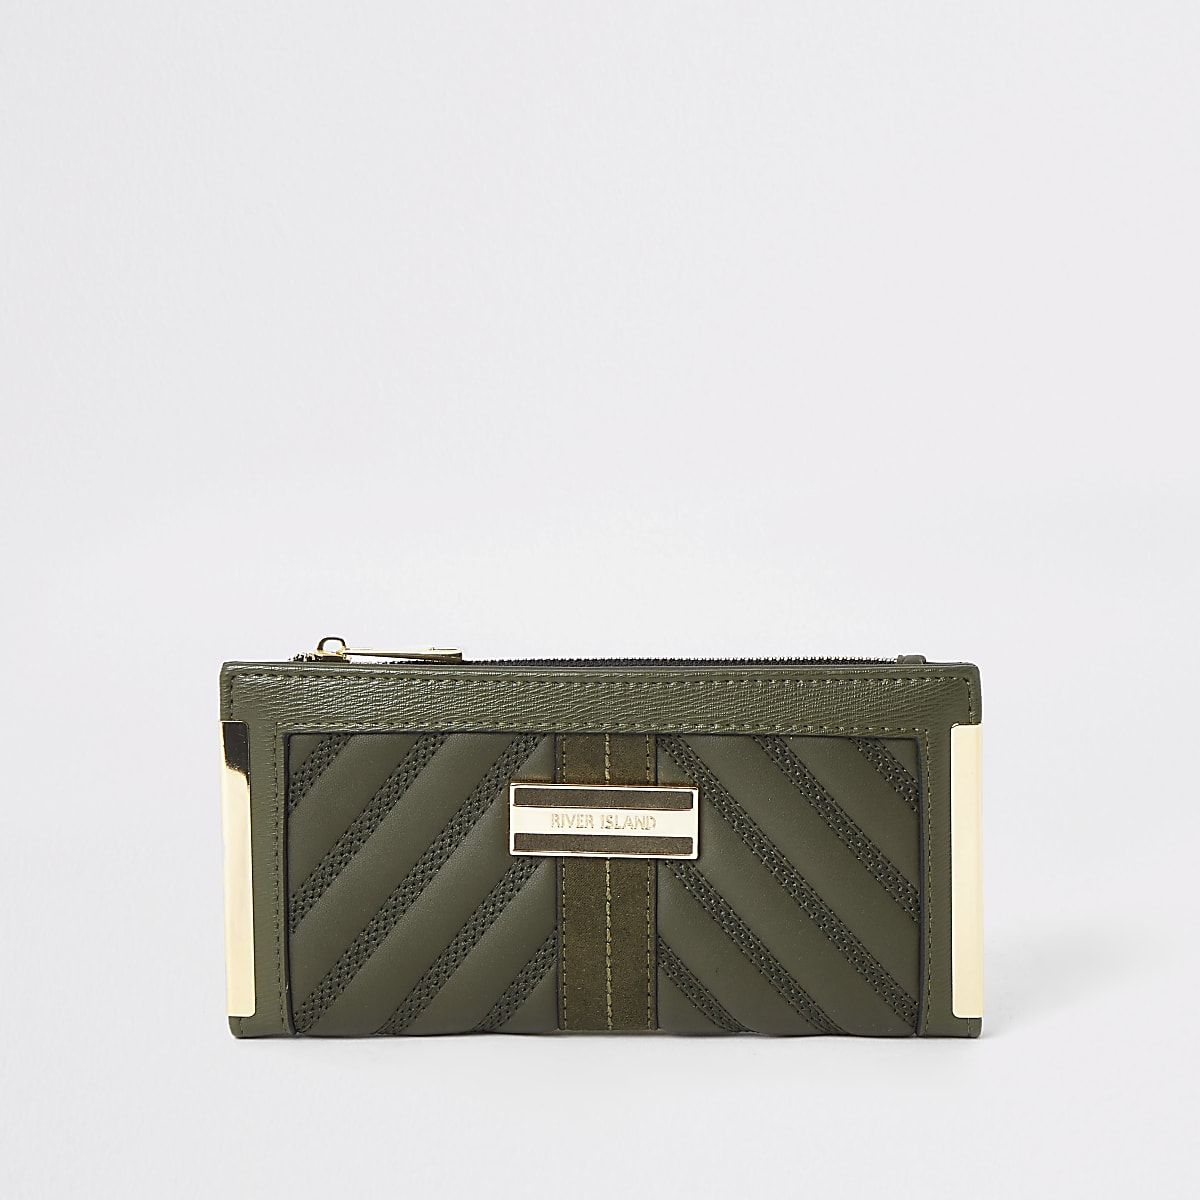 Kaki doorgestikte uitvouwbare portemonnee